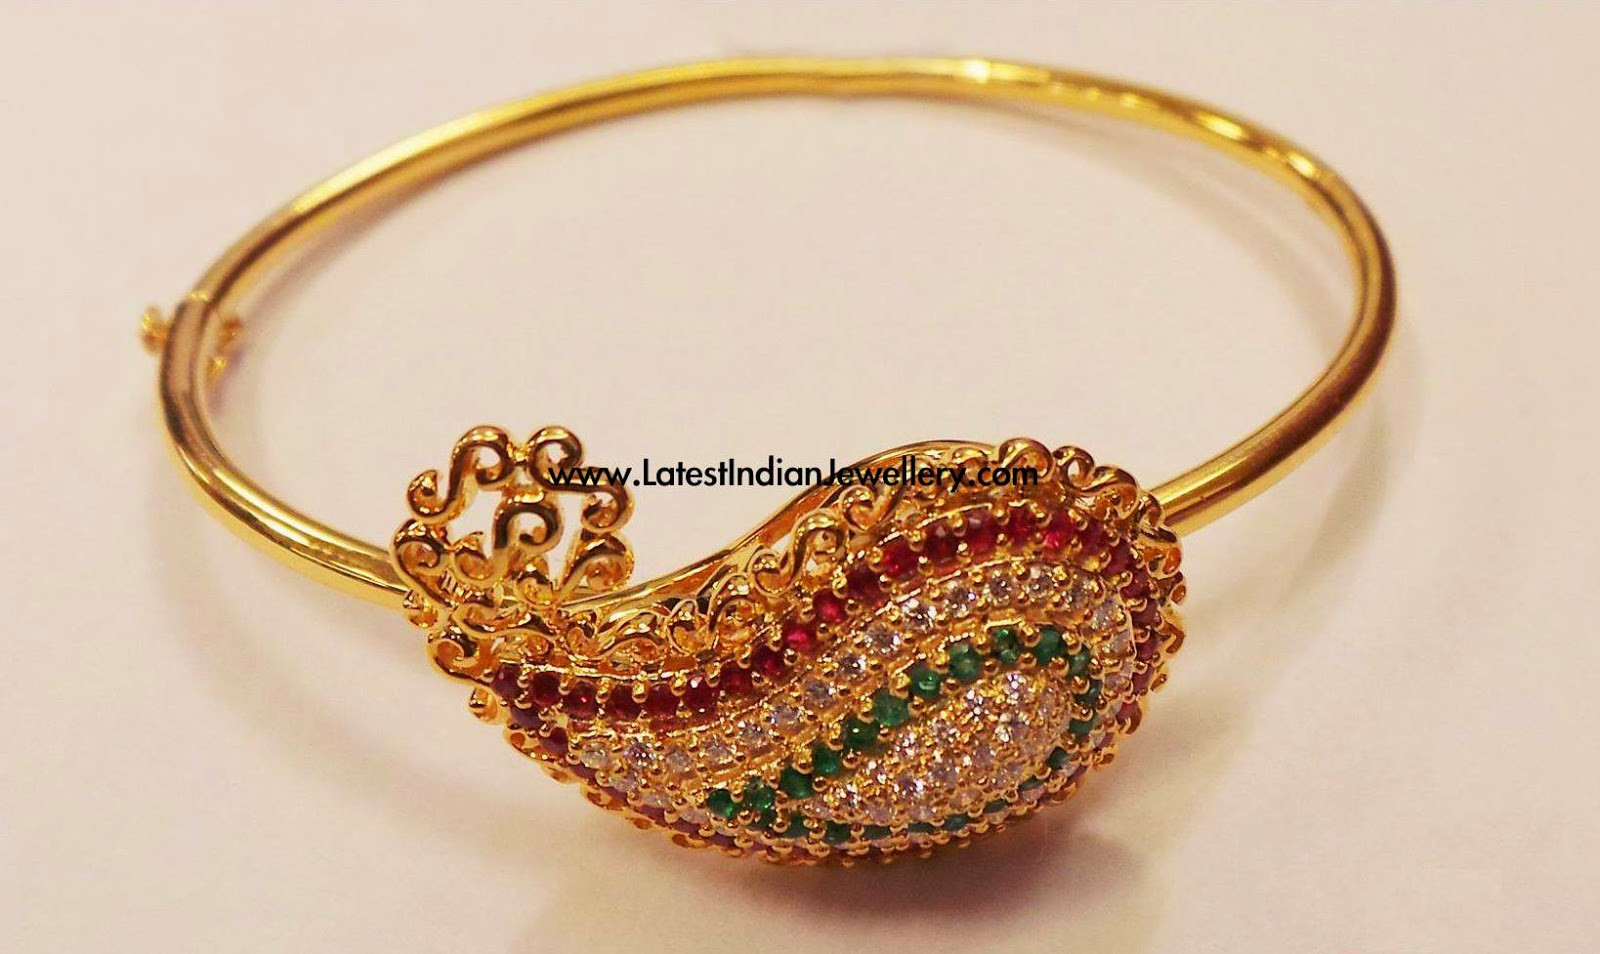 Diamond Bracelet in Paisley Design